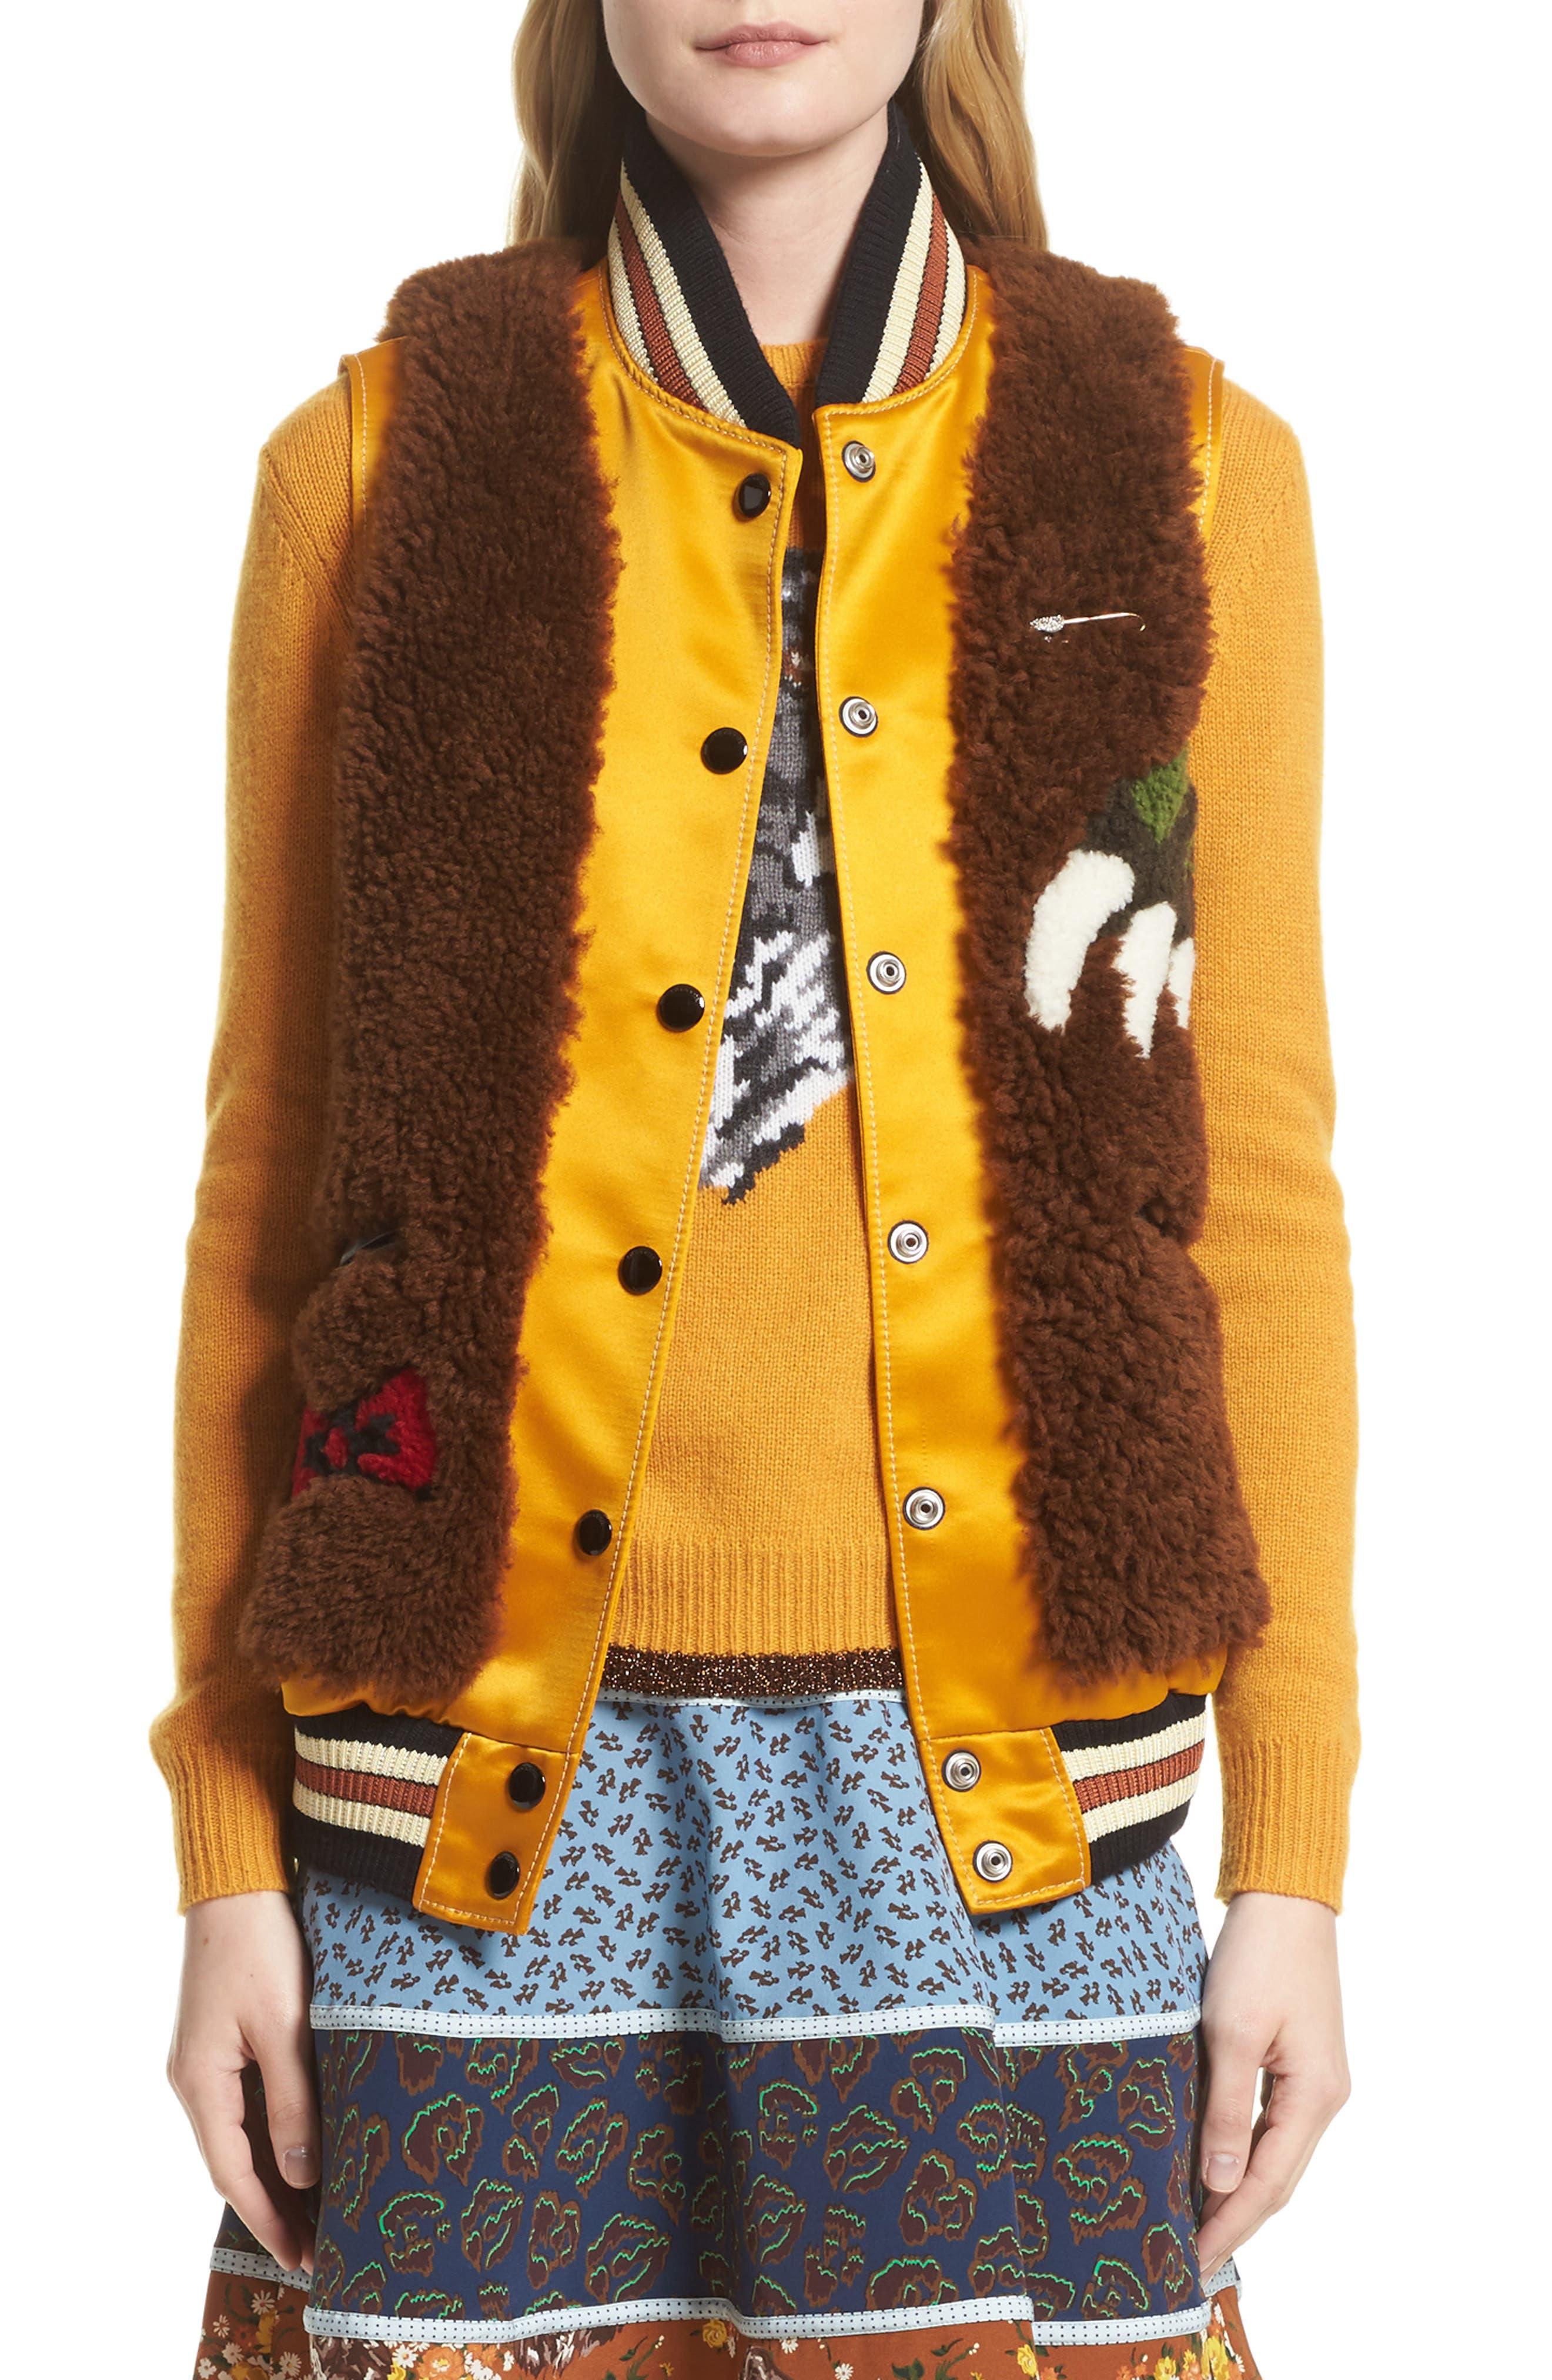 Main Image - COACH 1941 Rexy Intarsia Genuine Shearling Vest